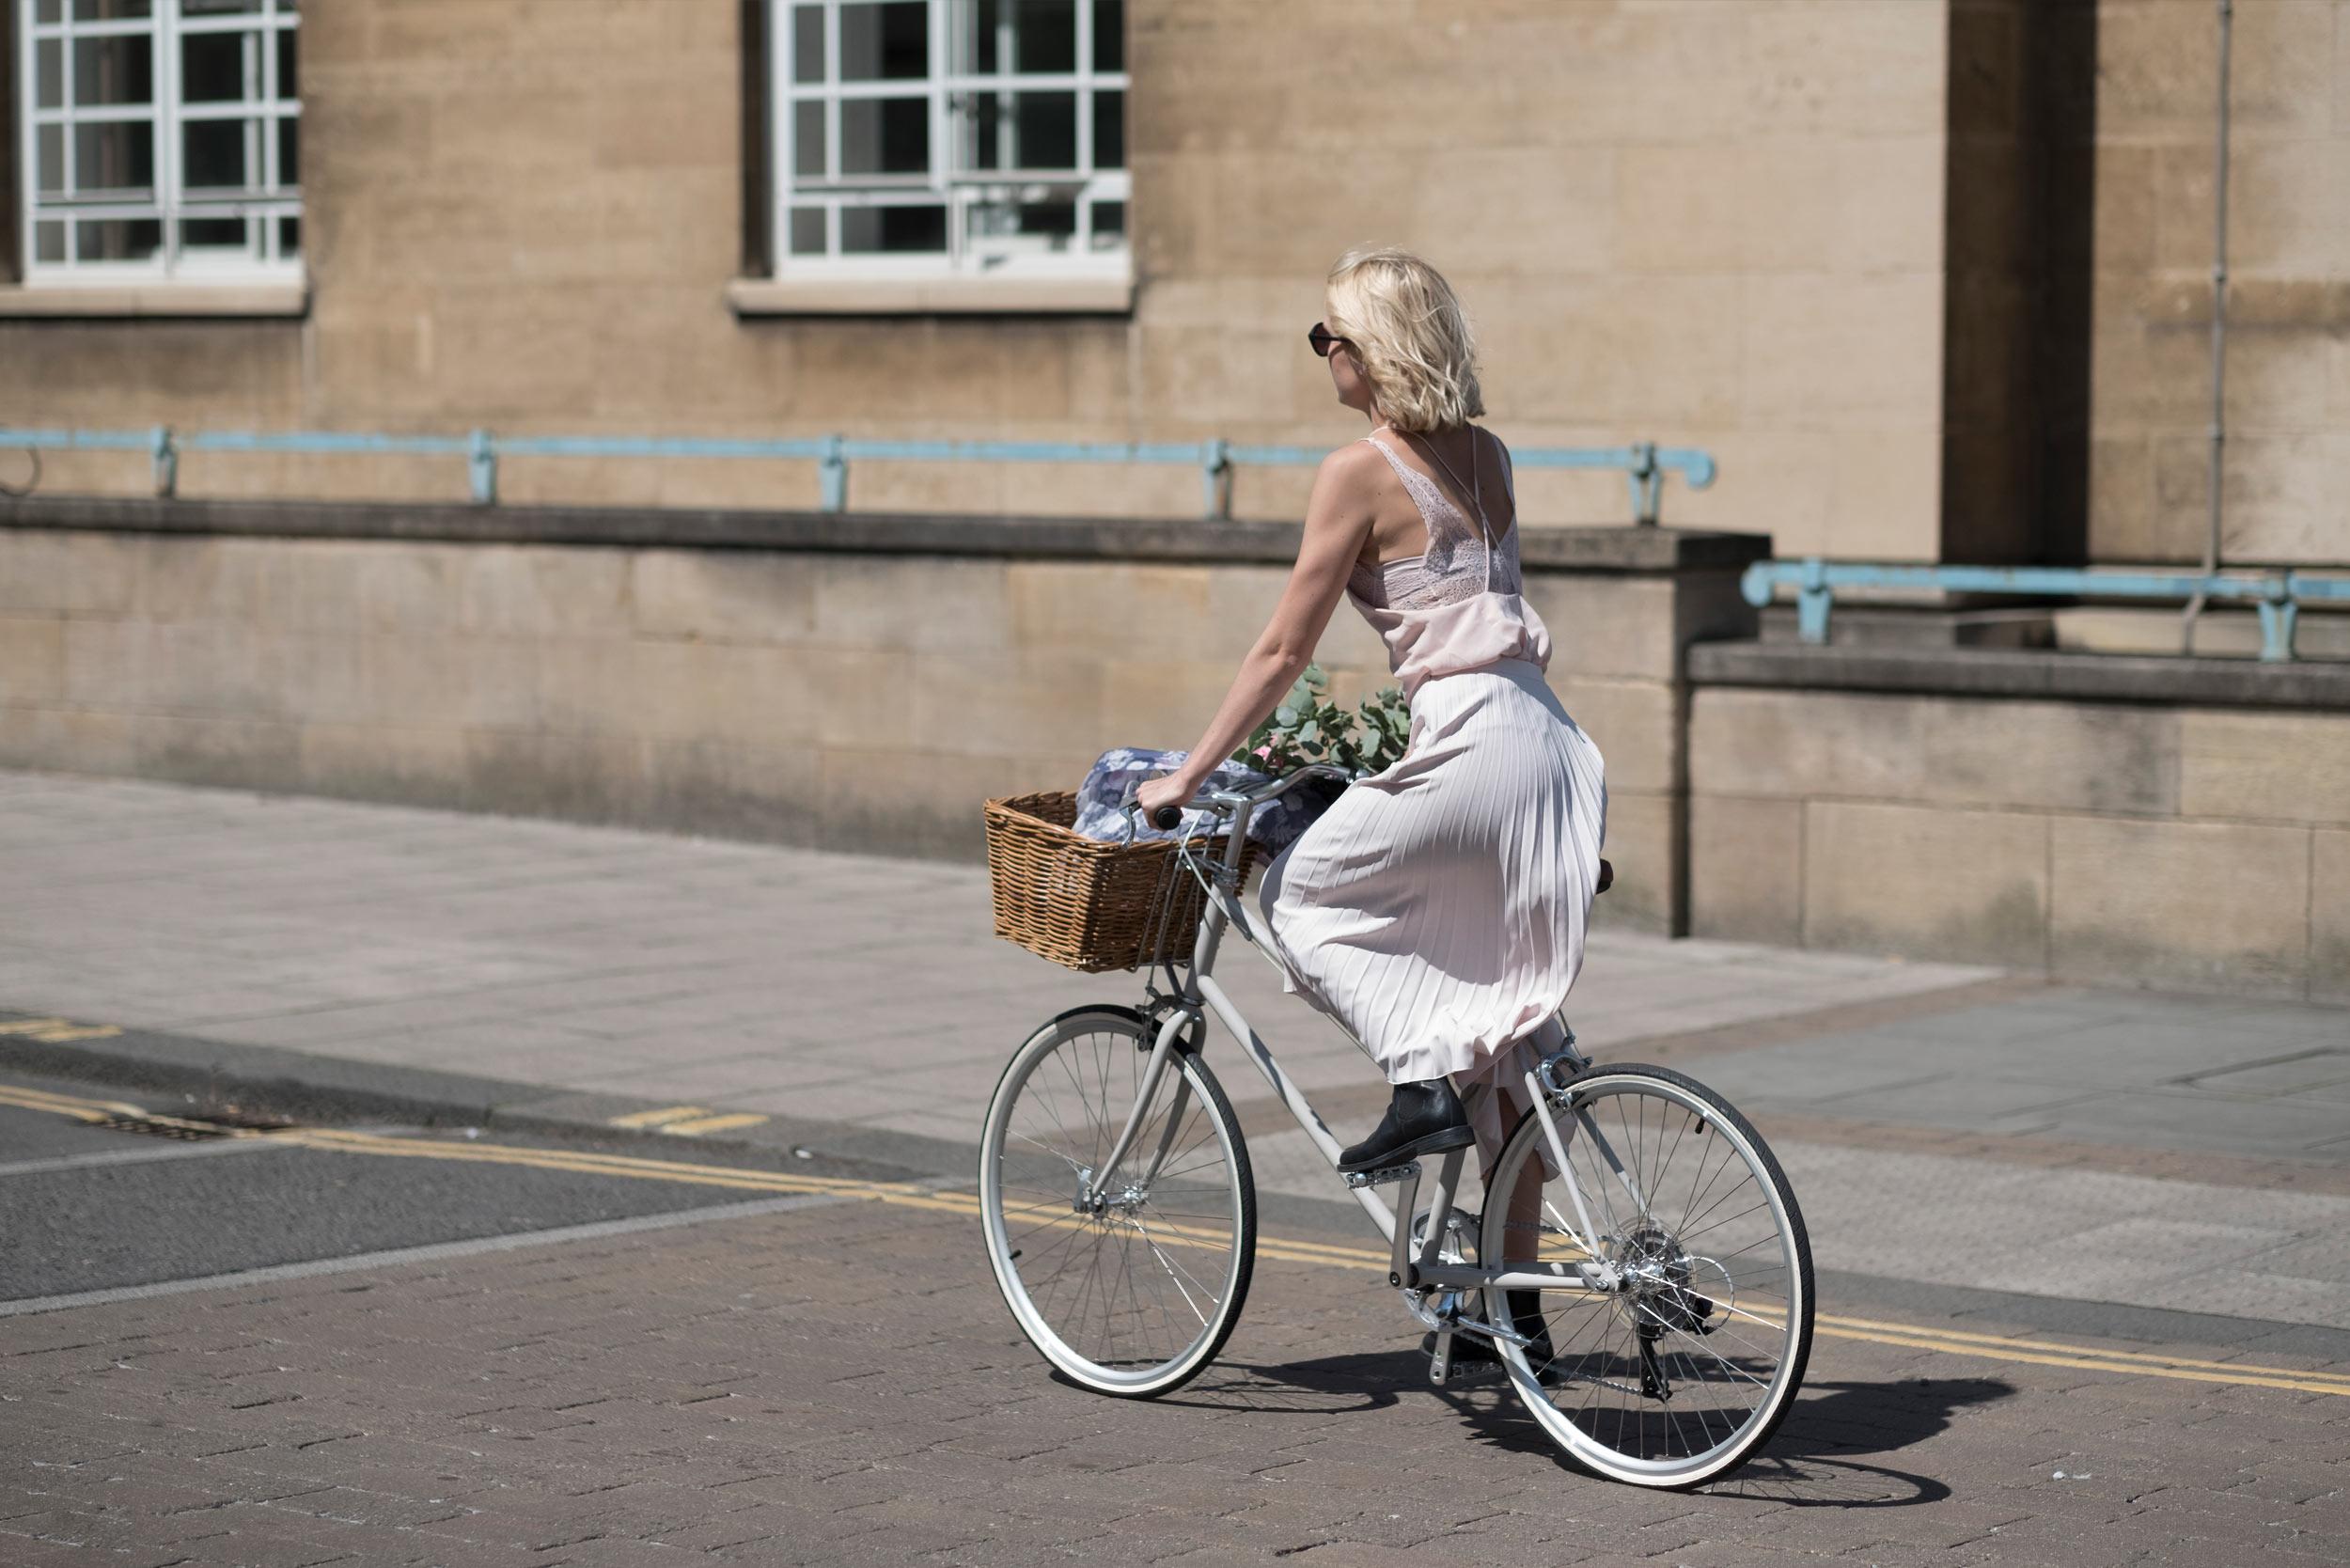 tokyobike-London-Norwich-Fiona-Burrage-Bike-County-Hall.jpg